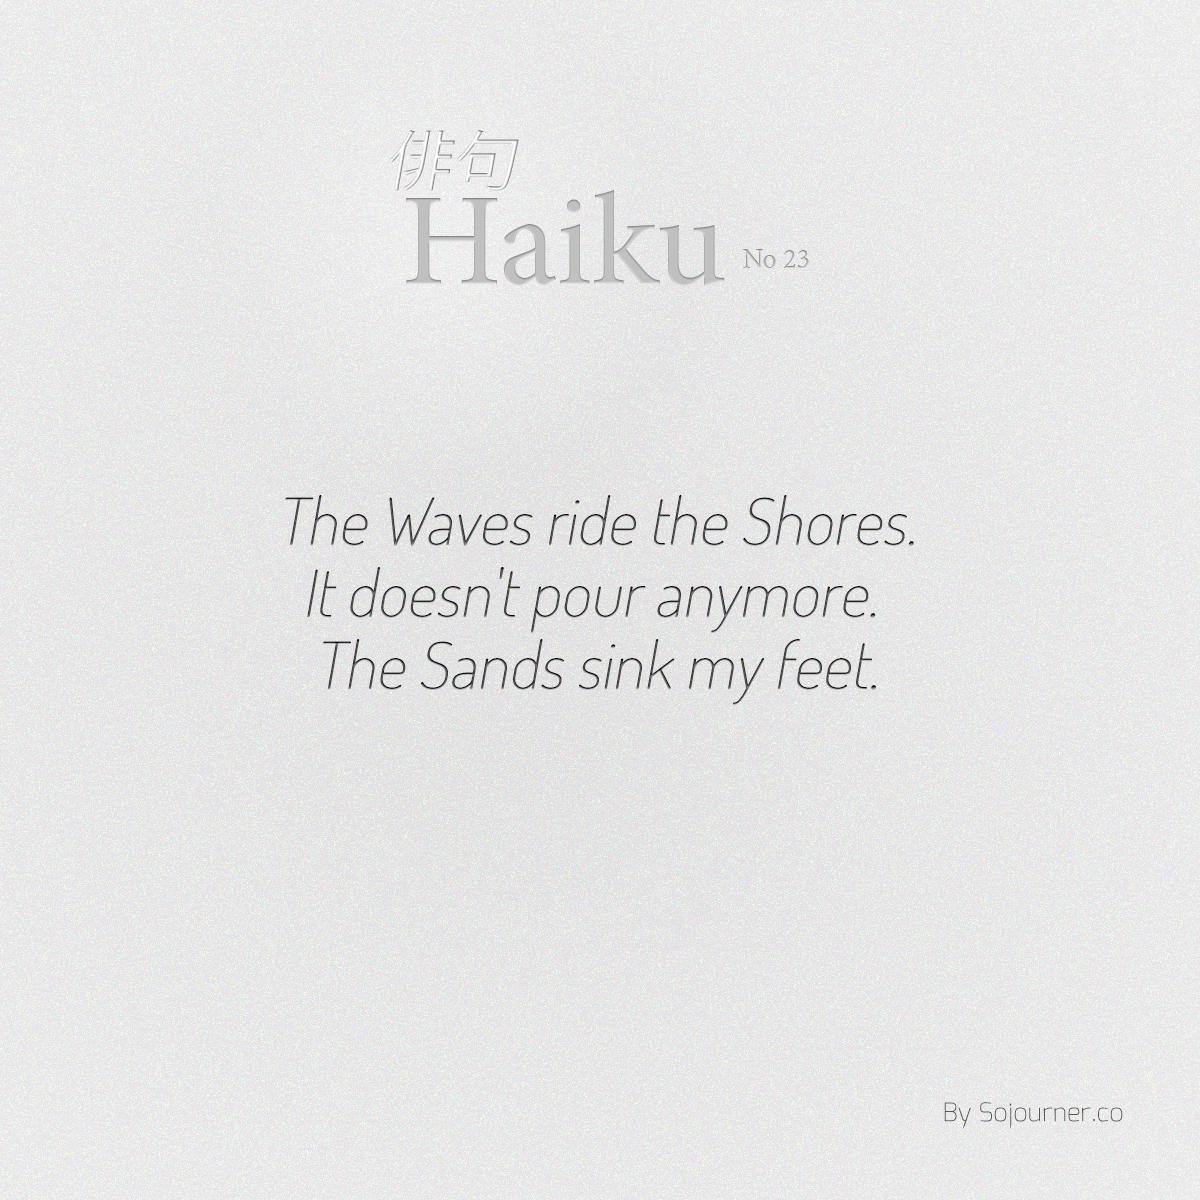 indefiniteloop.com - Haiku No. 23 - Shifting Sands.